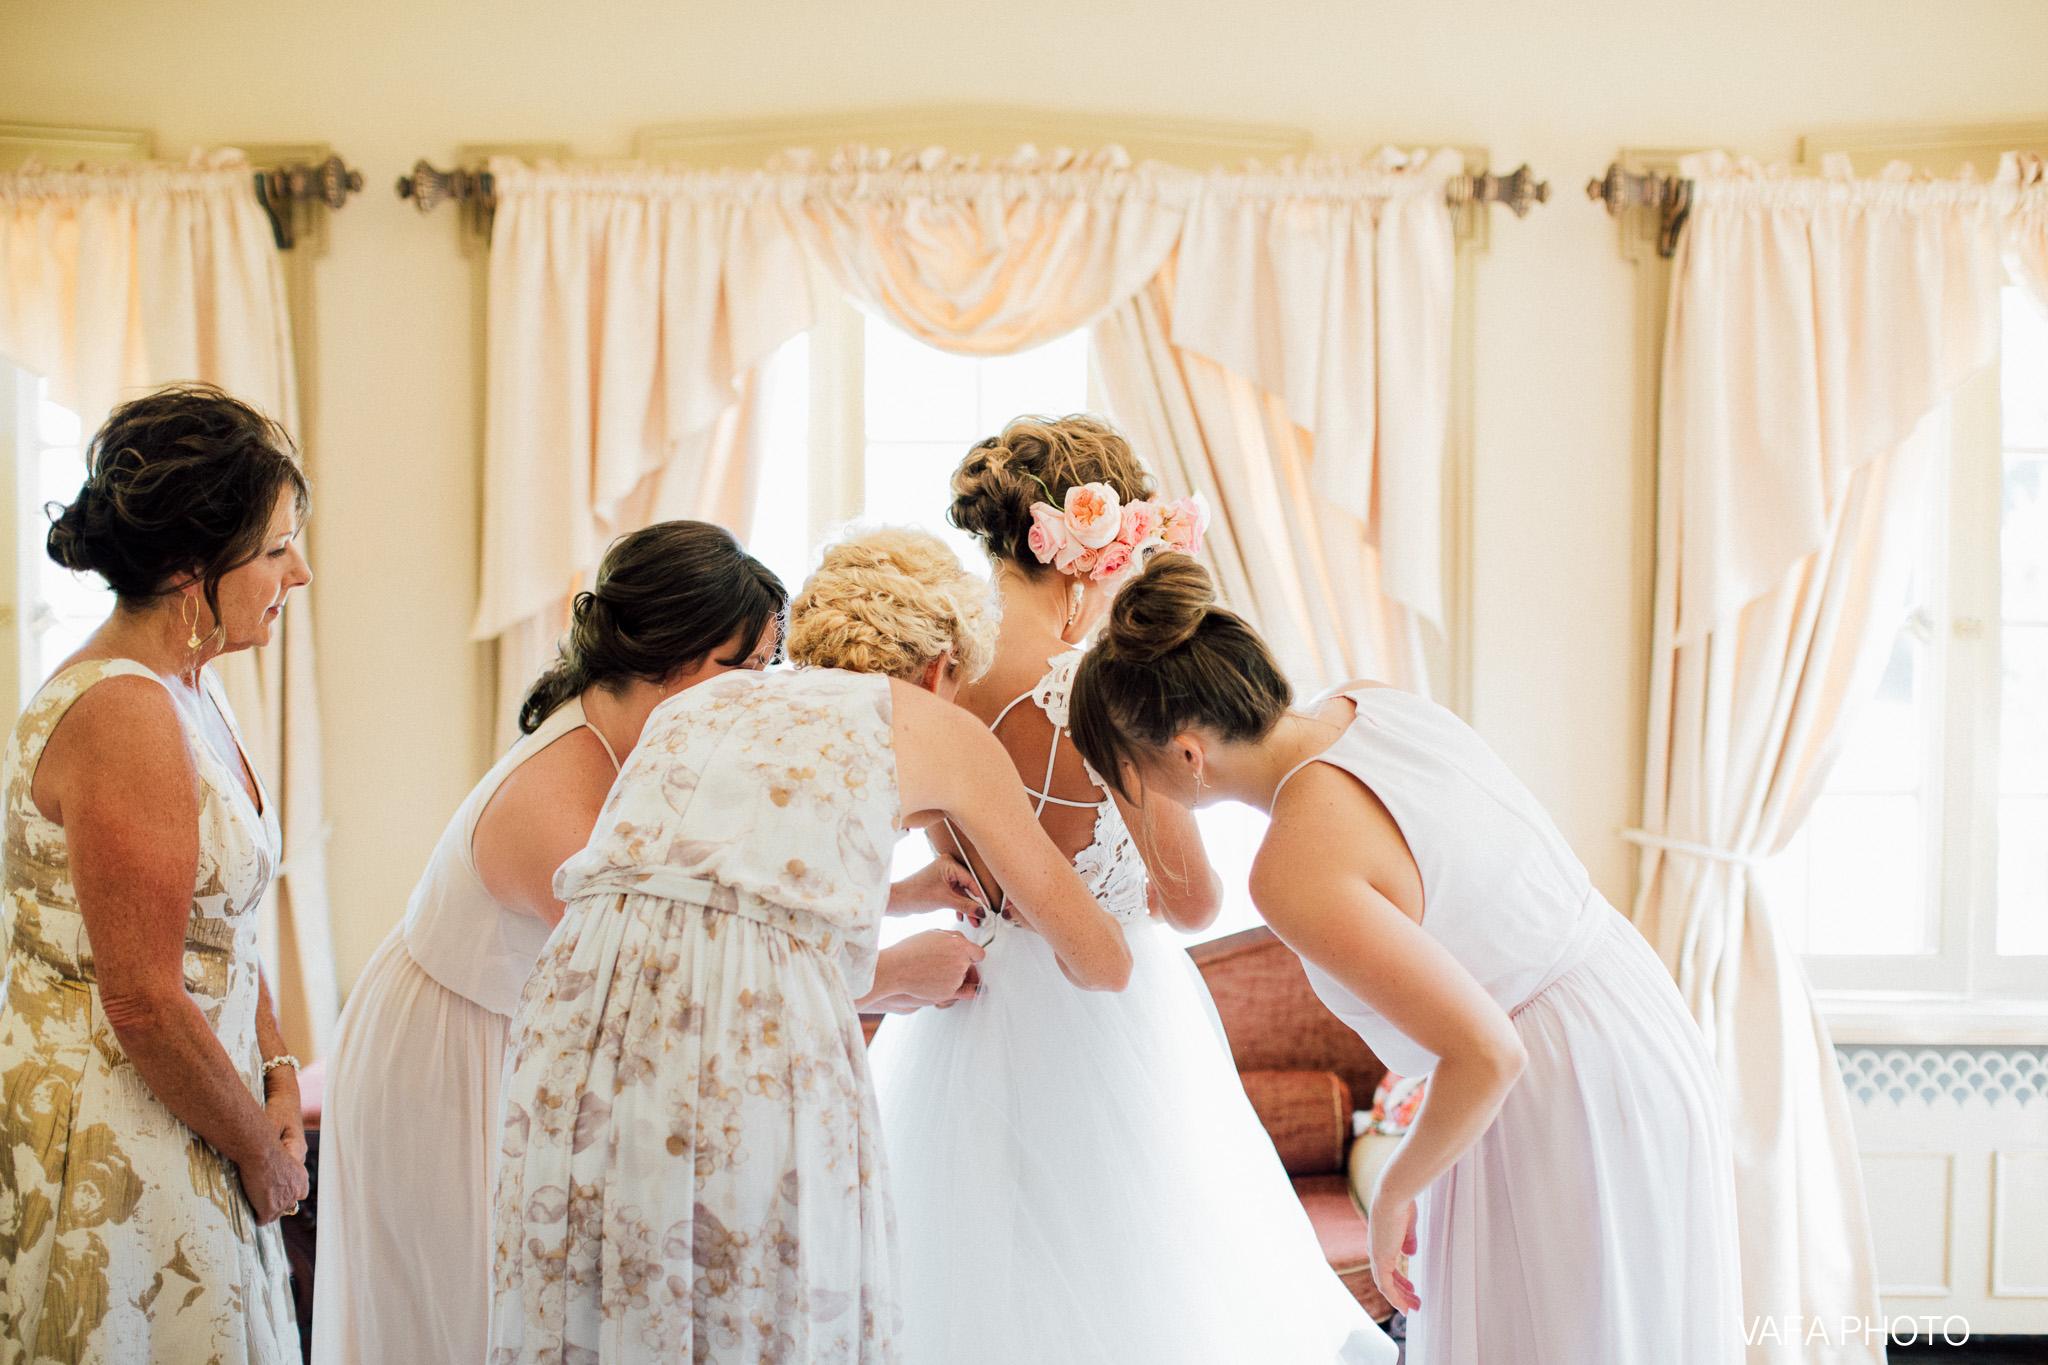 The-Felt-Estate-Wedding-Kailie-David-Vafa-Photo-155.jpg